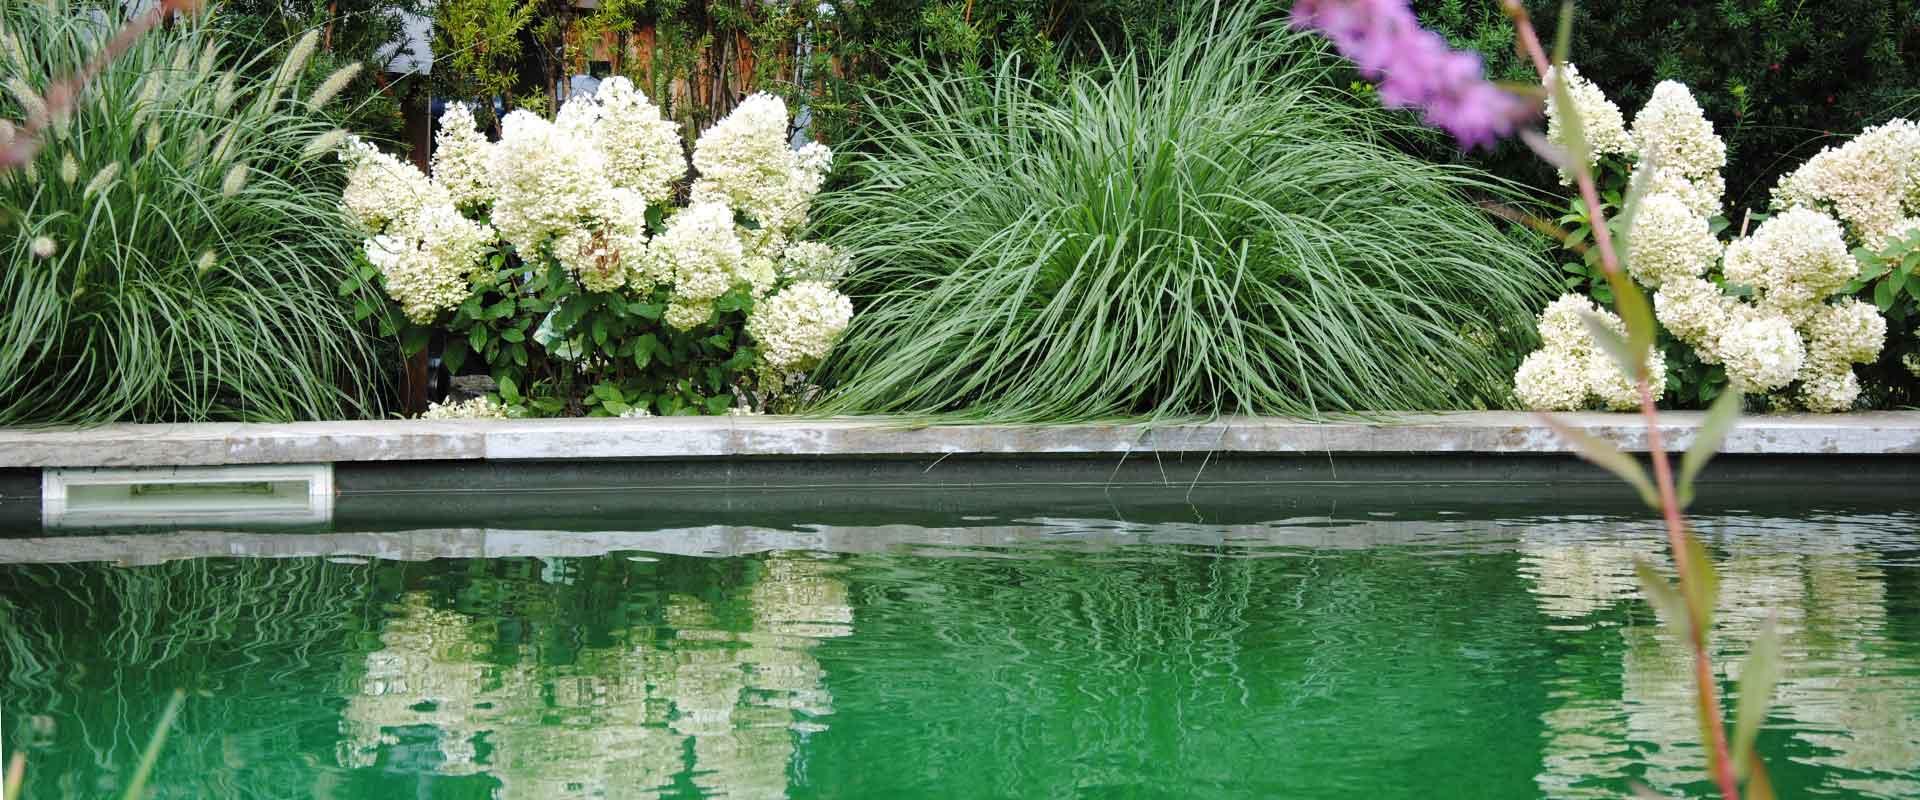 martin-haeringer-gartenbau-landschaftsbau-pool-naturpool-header-03